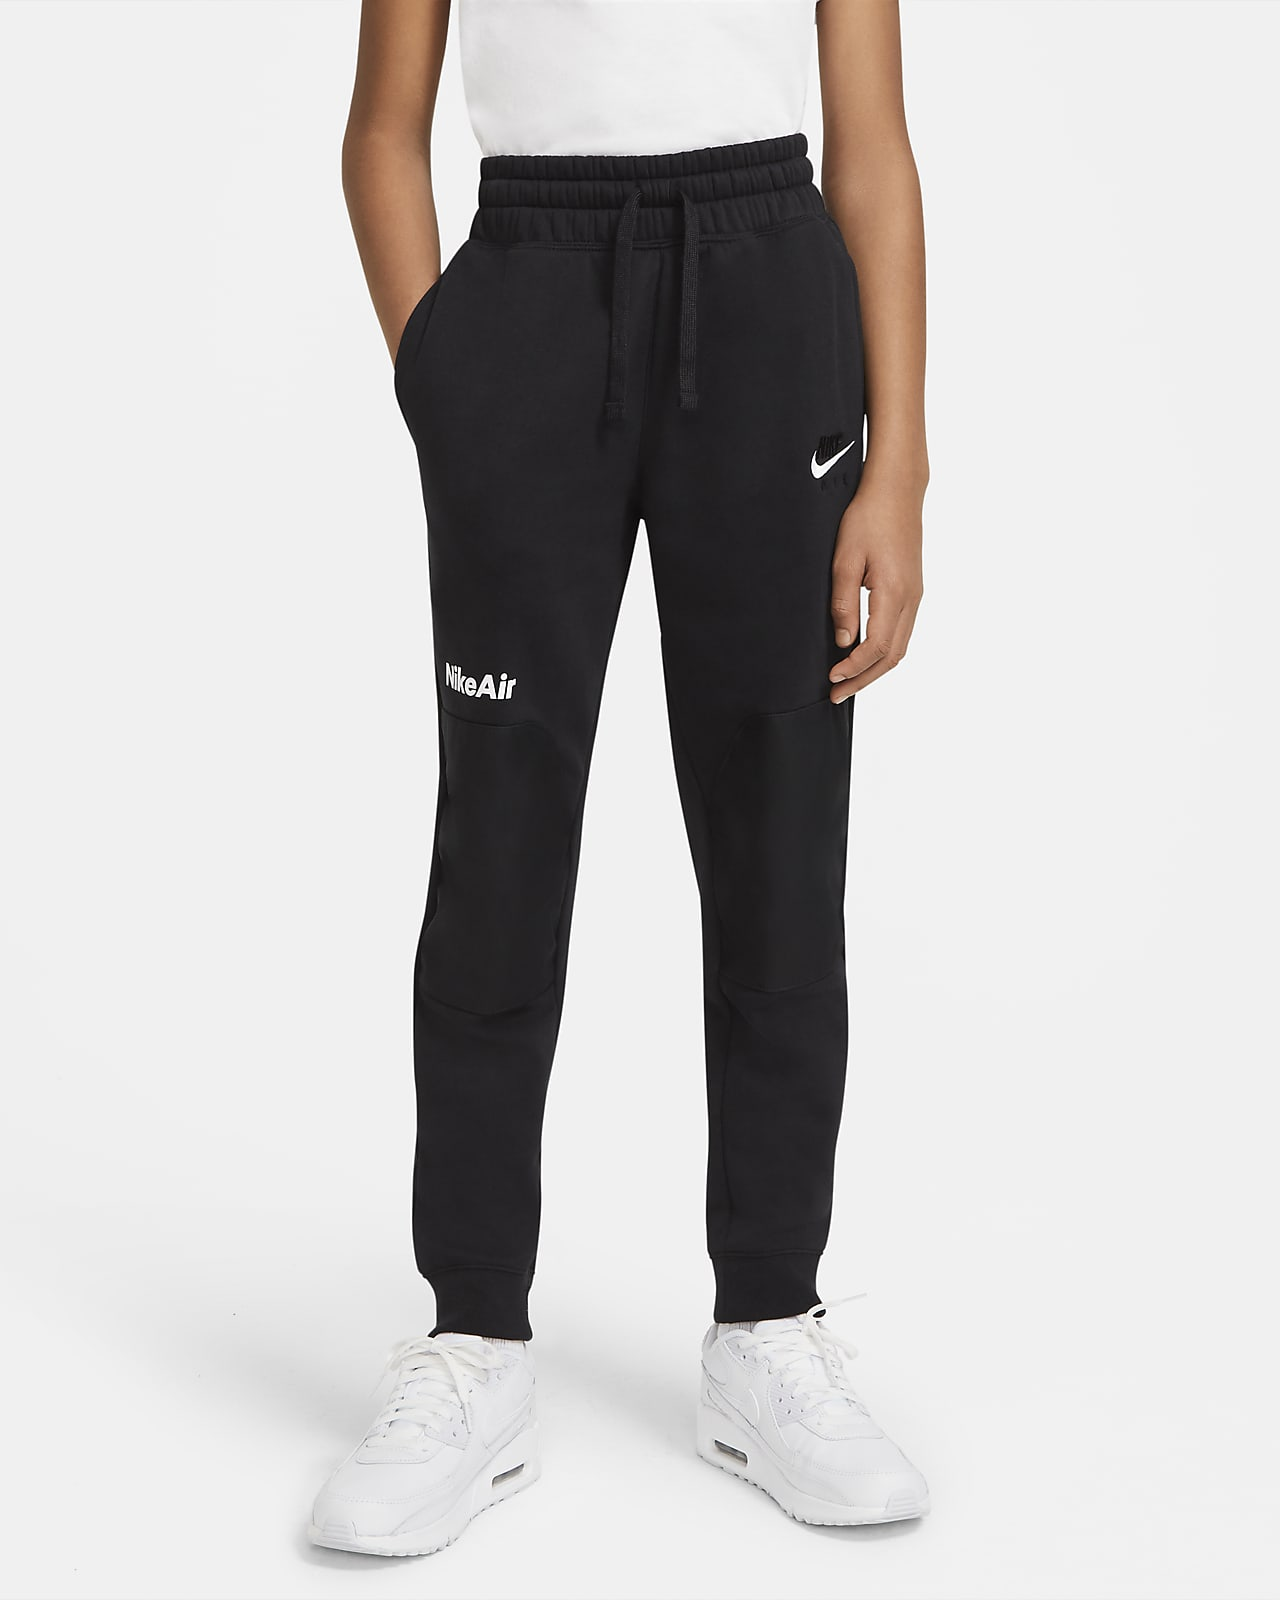 Pantalones Para Nino Talla Grande Nike Air Nike Mx